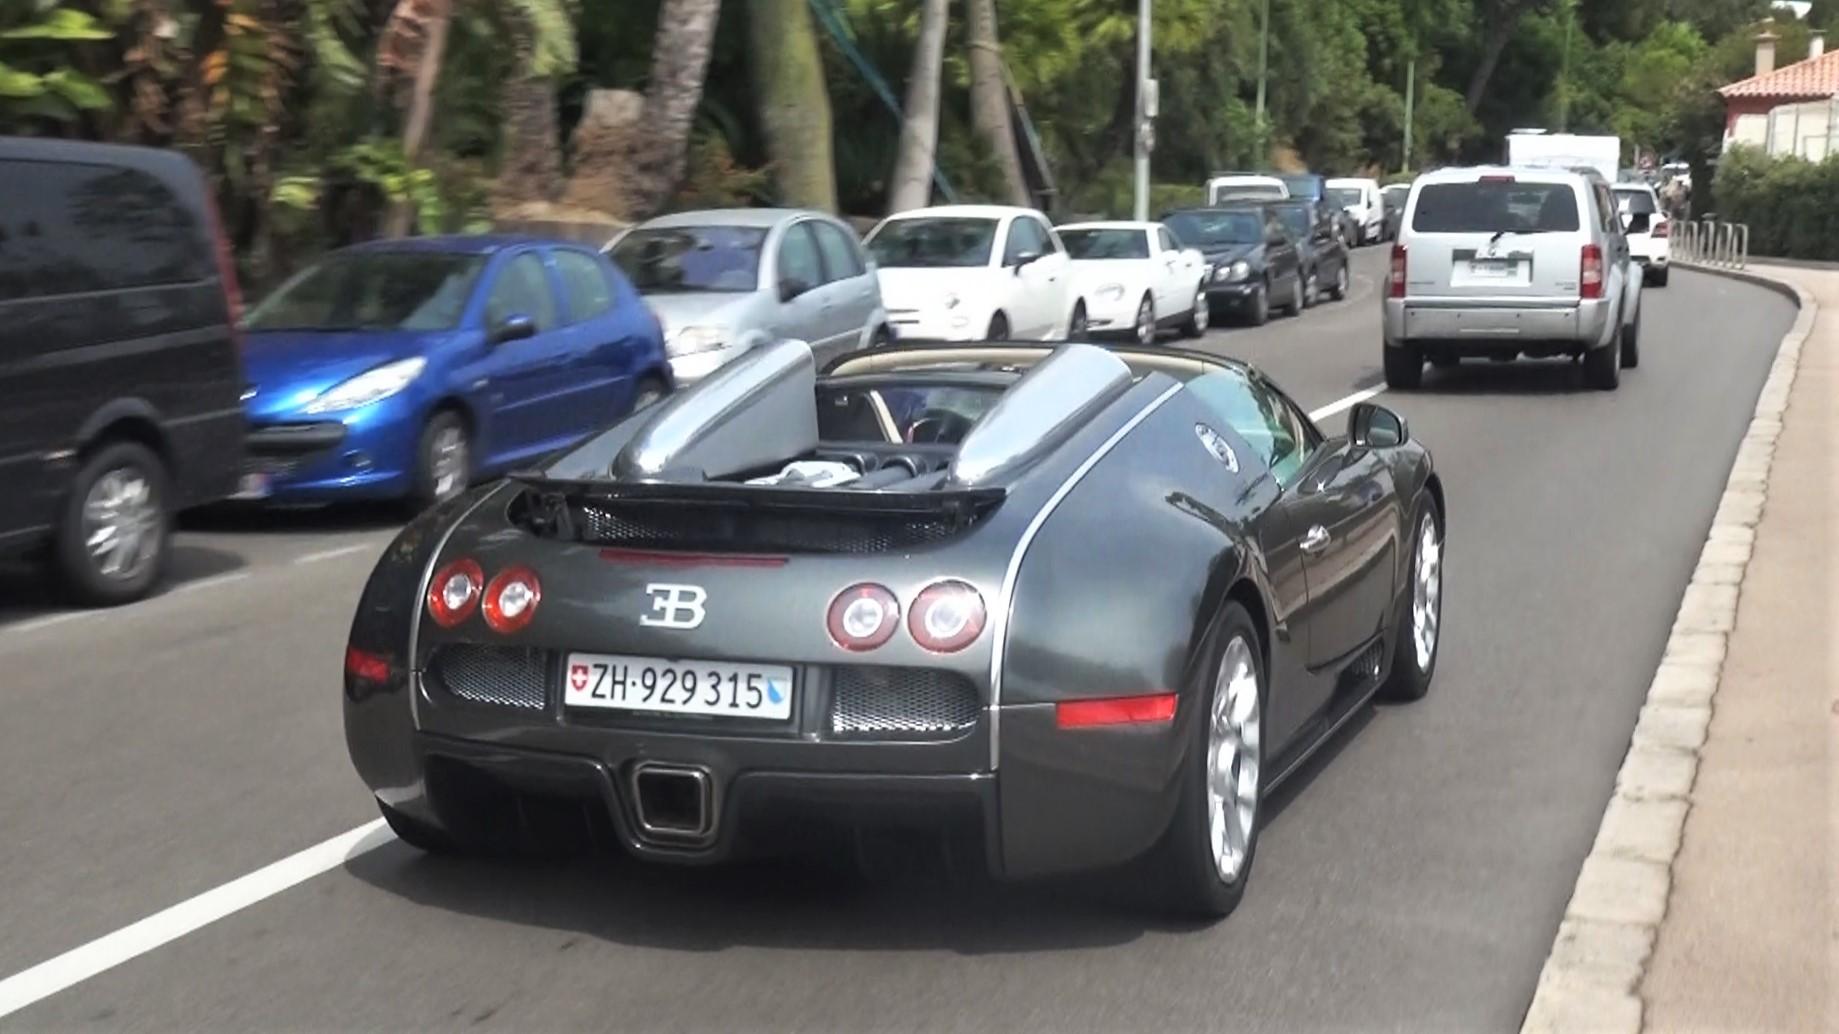 Bugatti Veyron Grand Sport - ZH-929315 (CH)